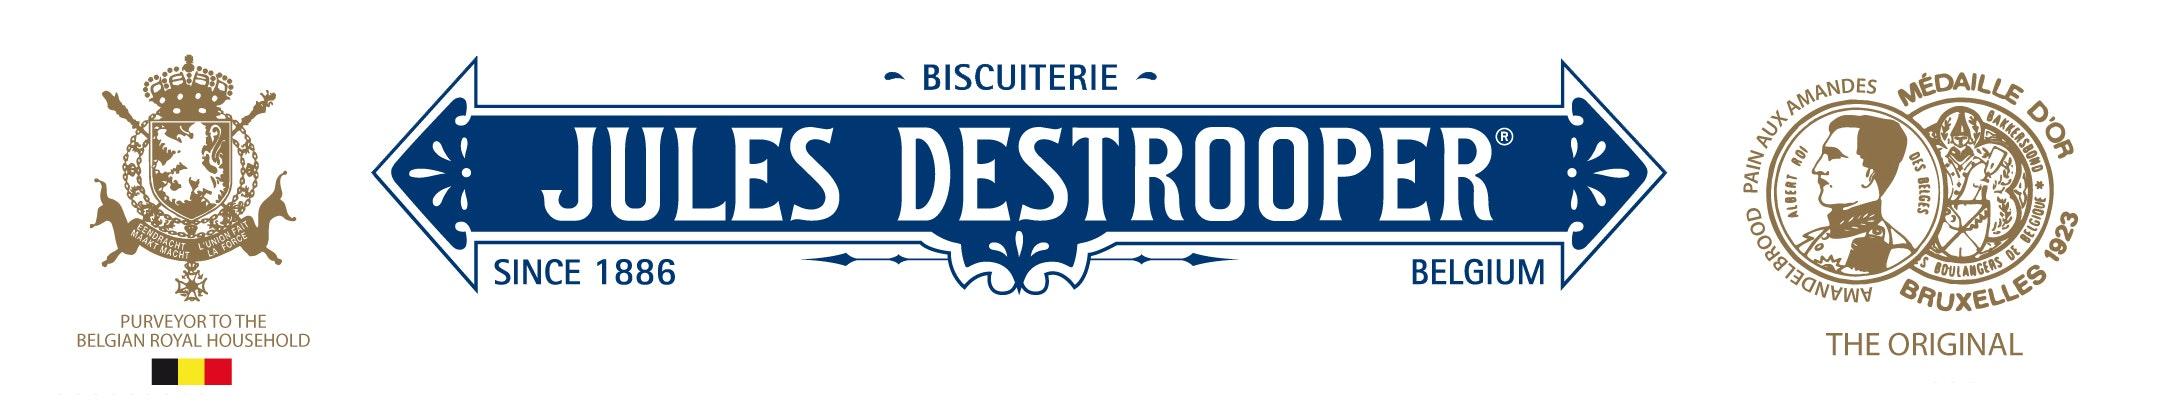 Jules Destrooper biscuits sweepstakes